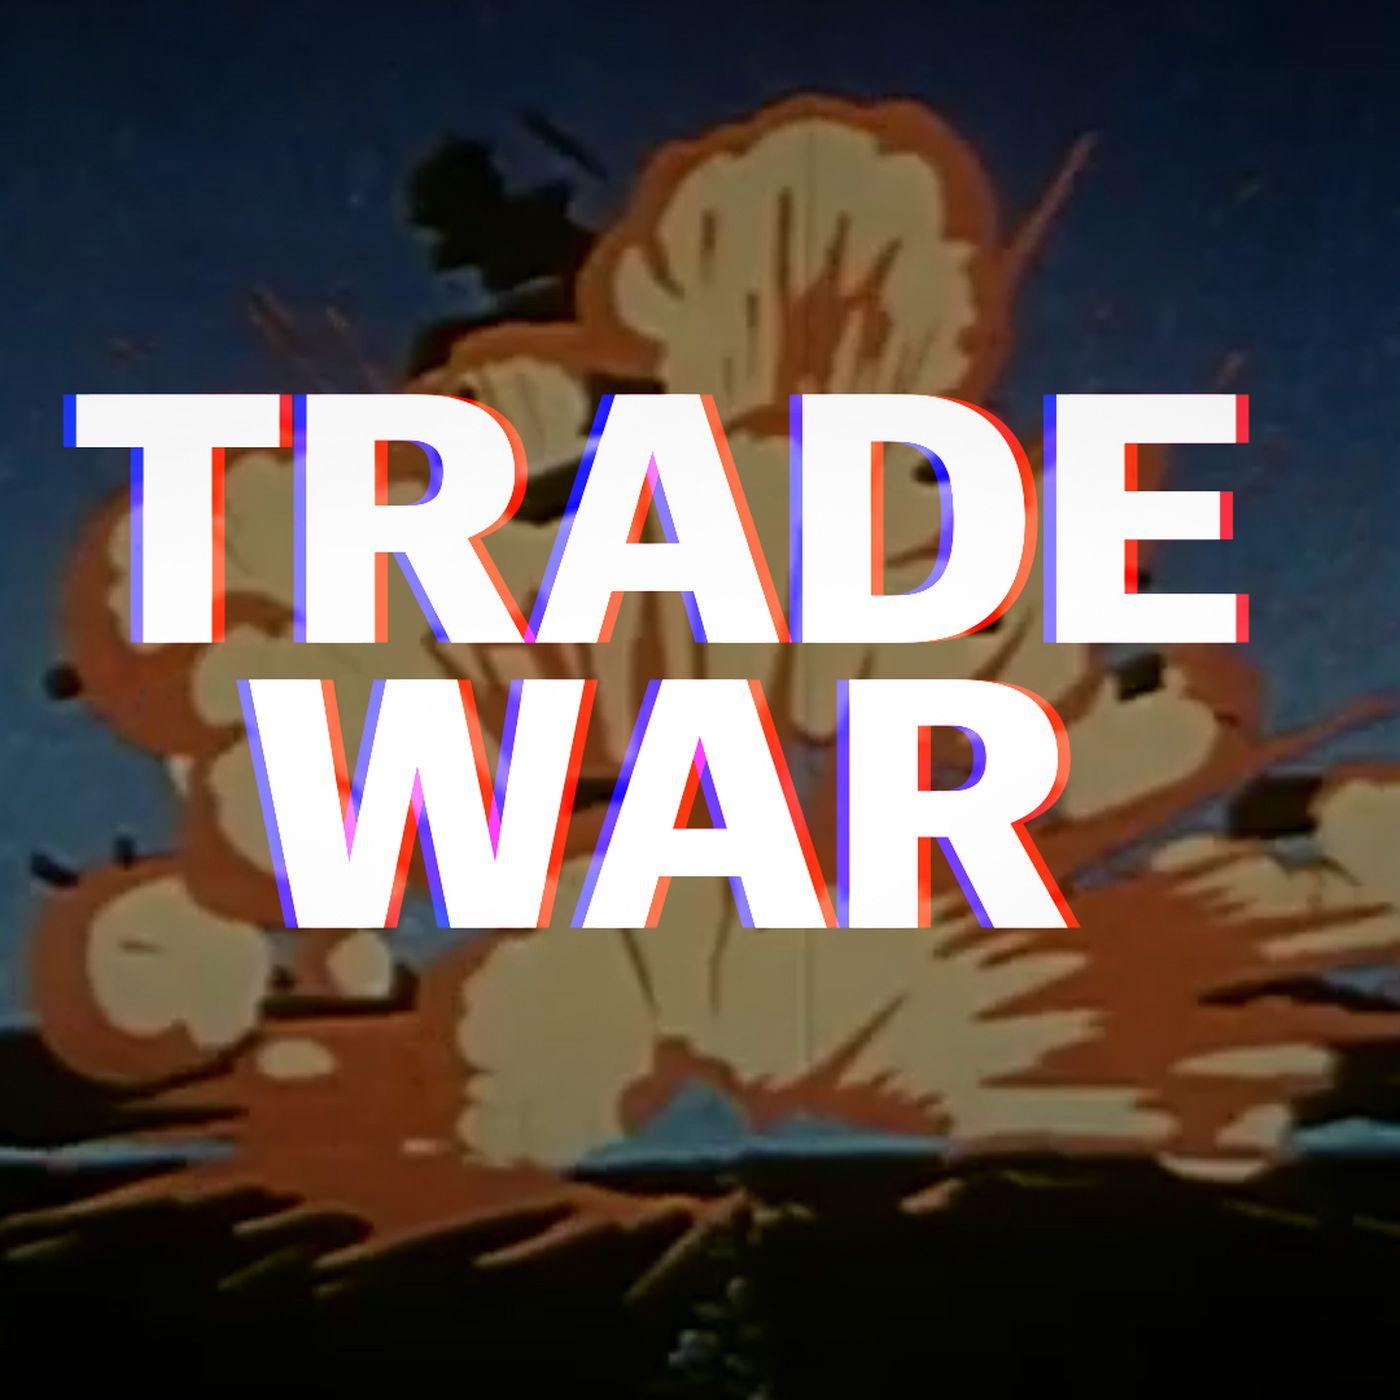 Trade wars, explained - Vox